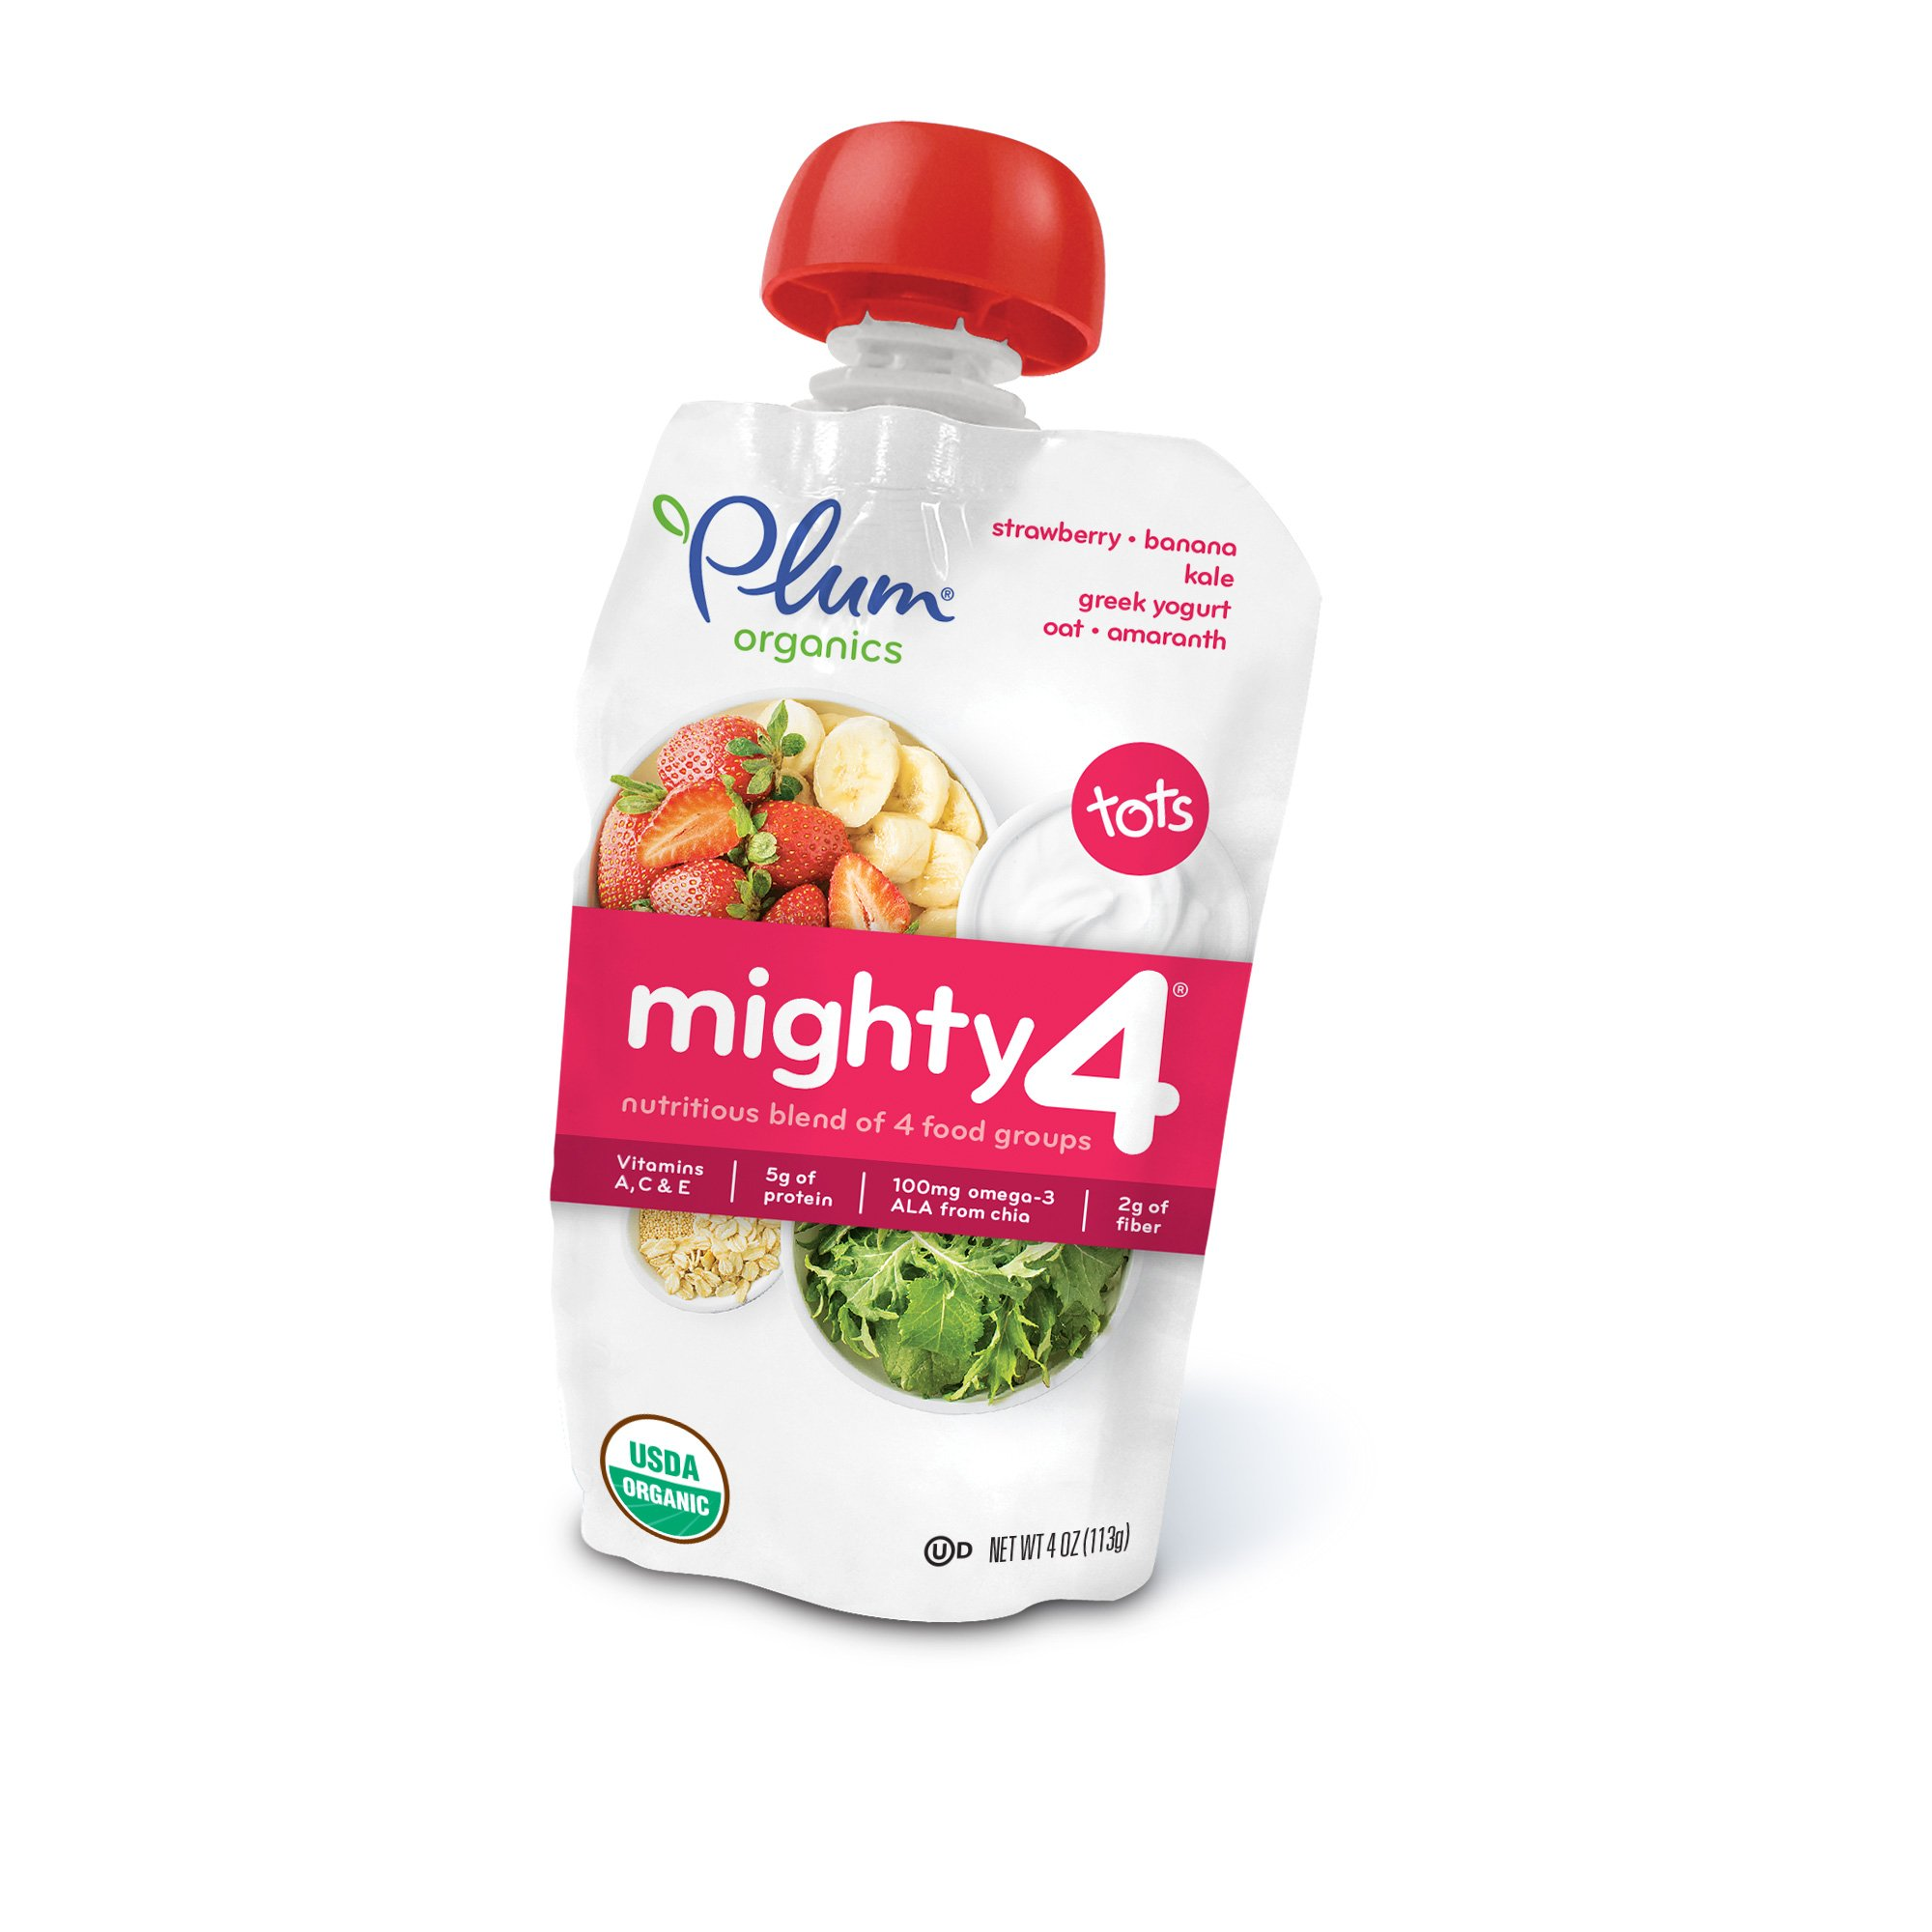 Plum Organics Mighty 4, Organic Toddler Food, Strawberry, Banana, Kale, Greek Yogurt, Oat and Amaranth, 4 ounce pouch (Pack of 12)